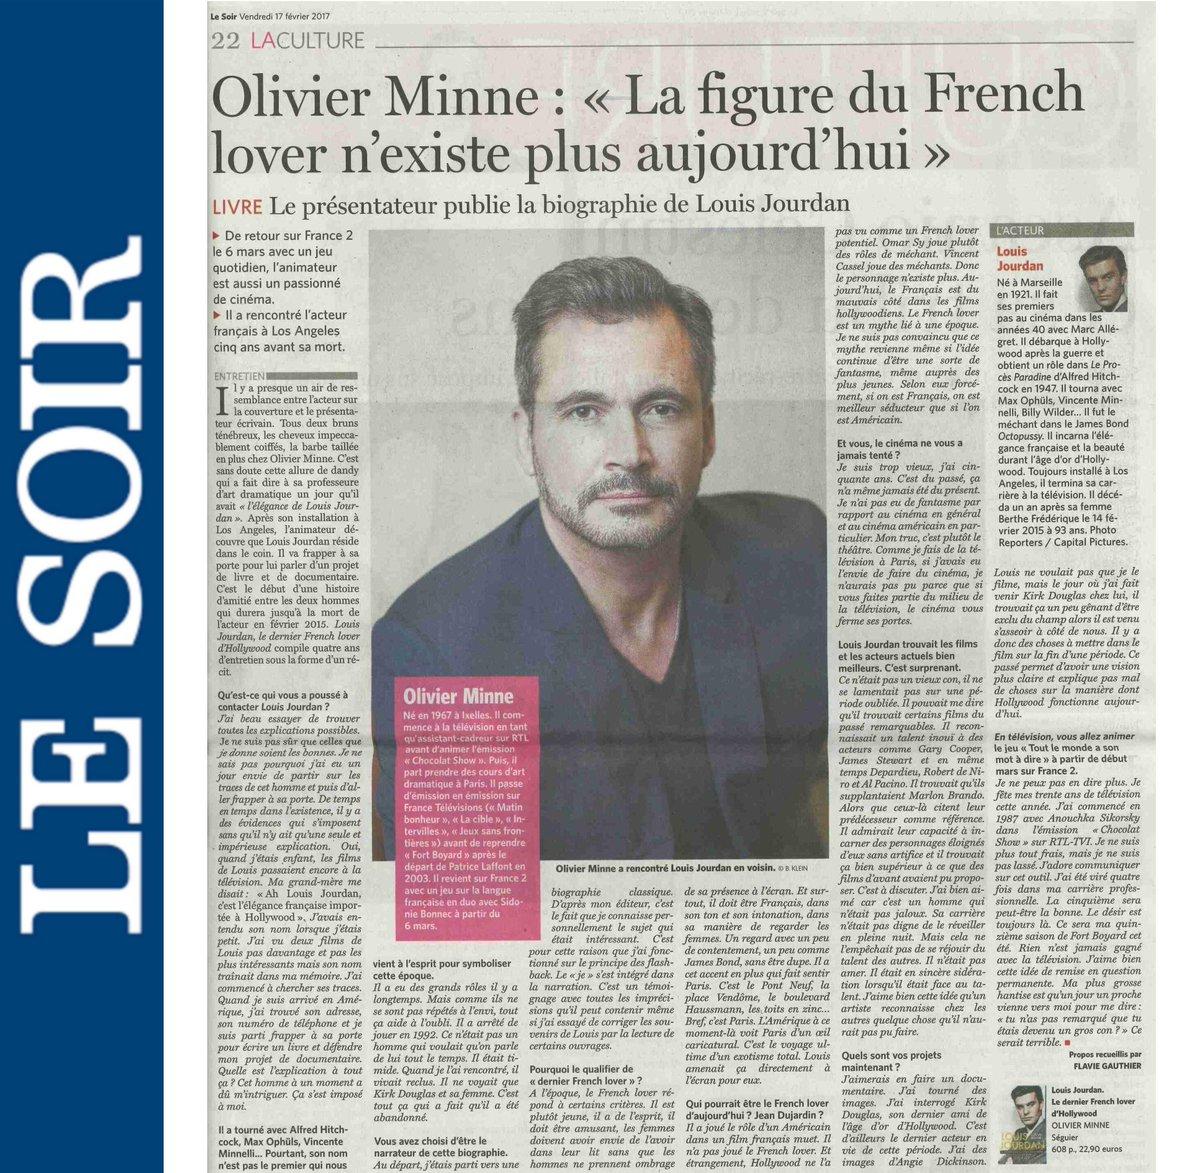 Portrait @olivierminne pleine page ds @lesoir pr sortie #biographie   http:// bit.ly/2hQr2rV  &nbsp;   sur #LouisJourdan #frenchlover  #hollywood <br>http://pic.twitter.com/3CNf3piDQy